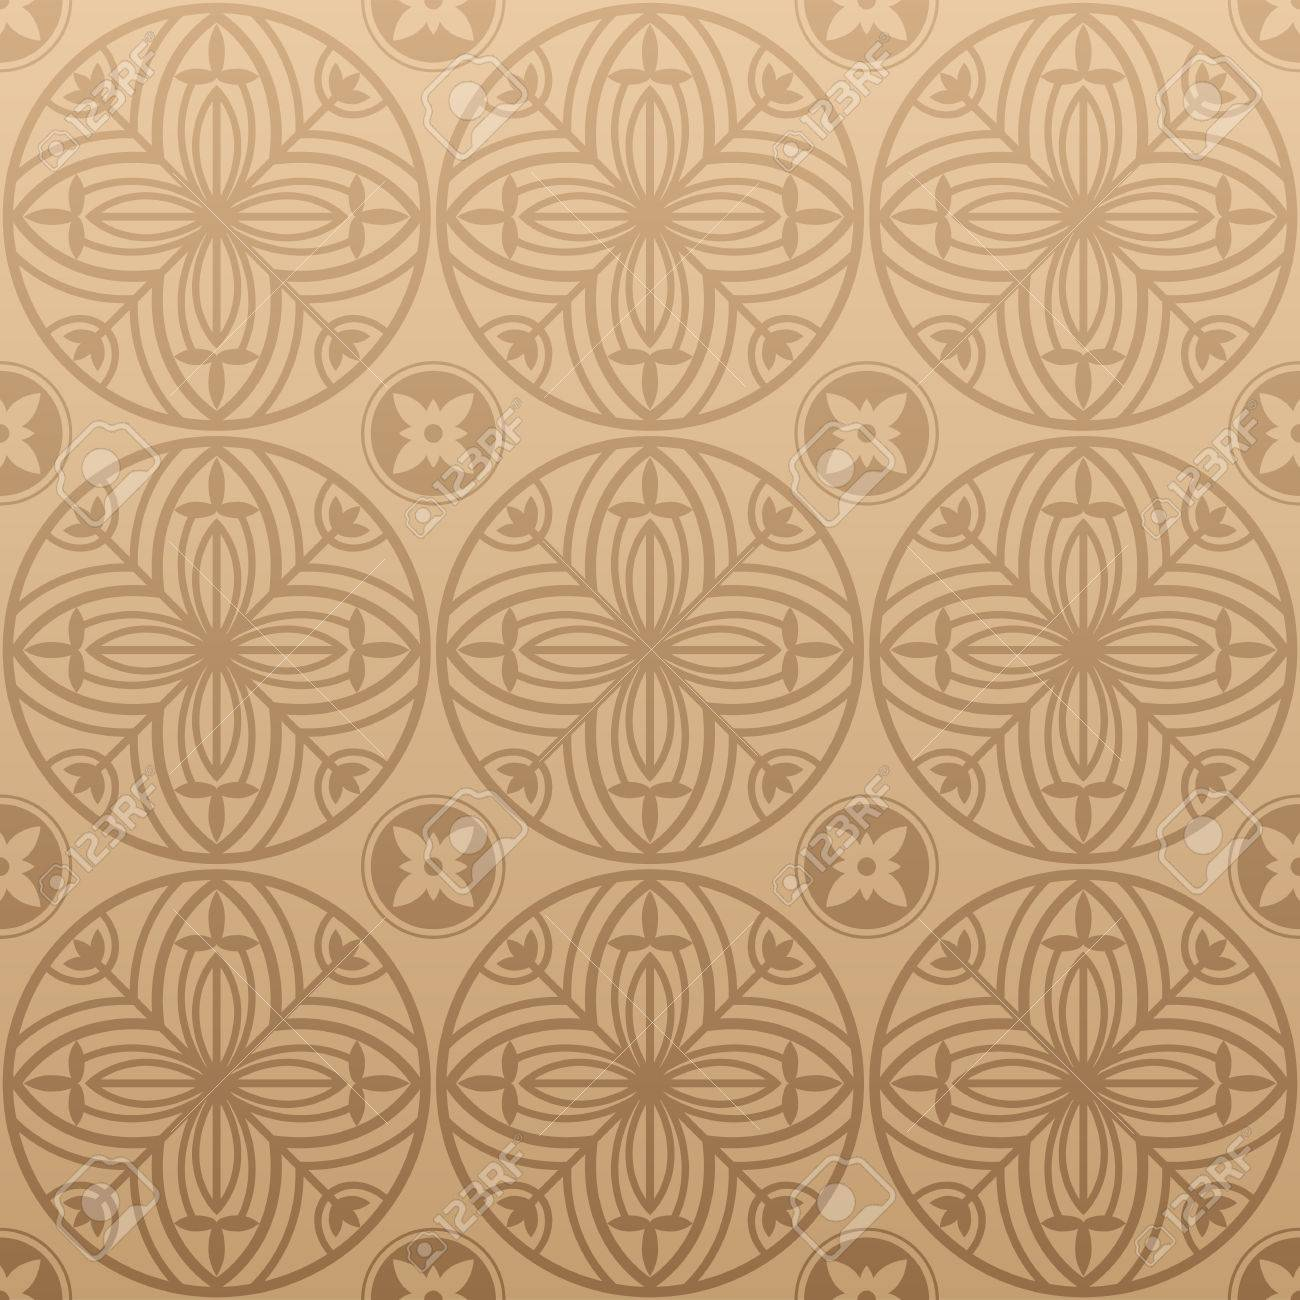 Basque Seamless Background Symbol. Vector Image. Stock Vector - 6032927